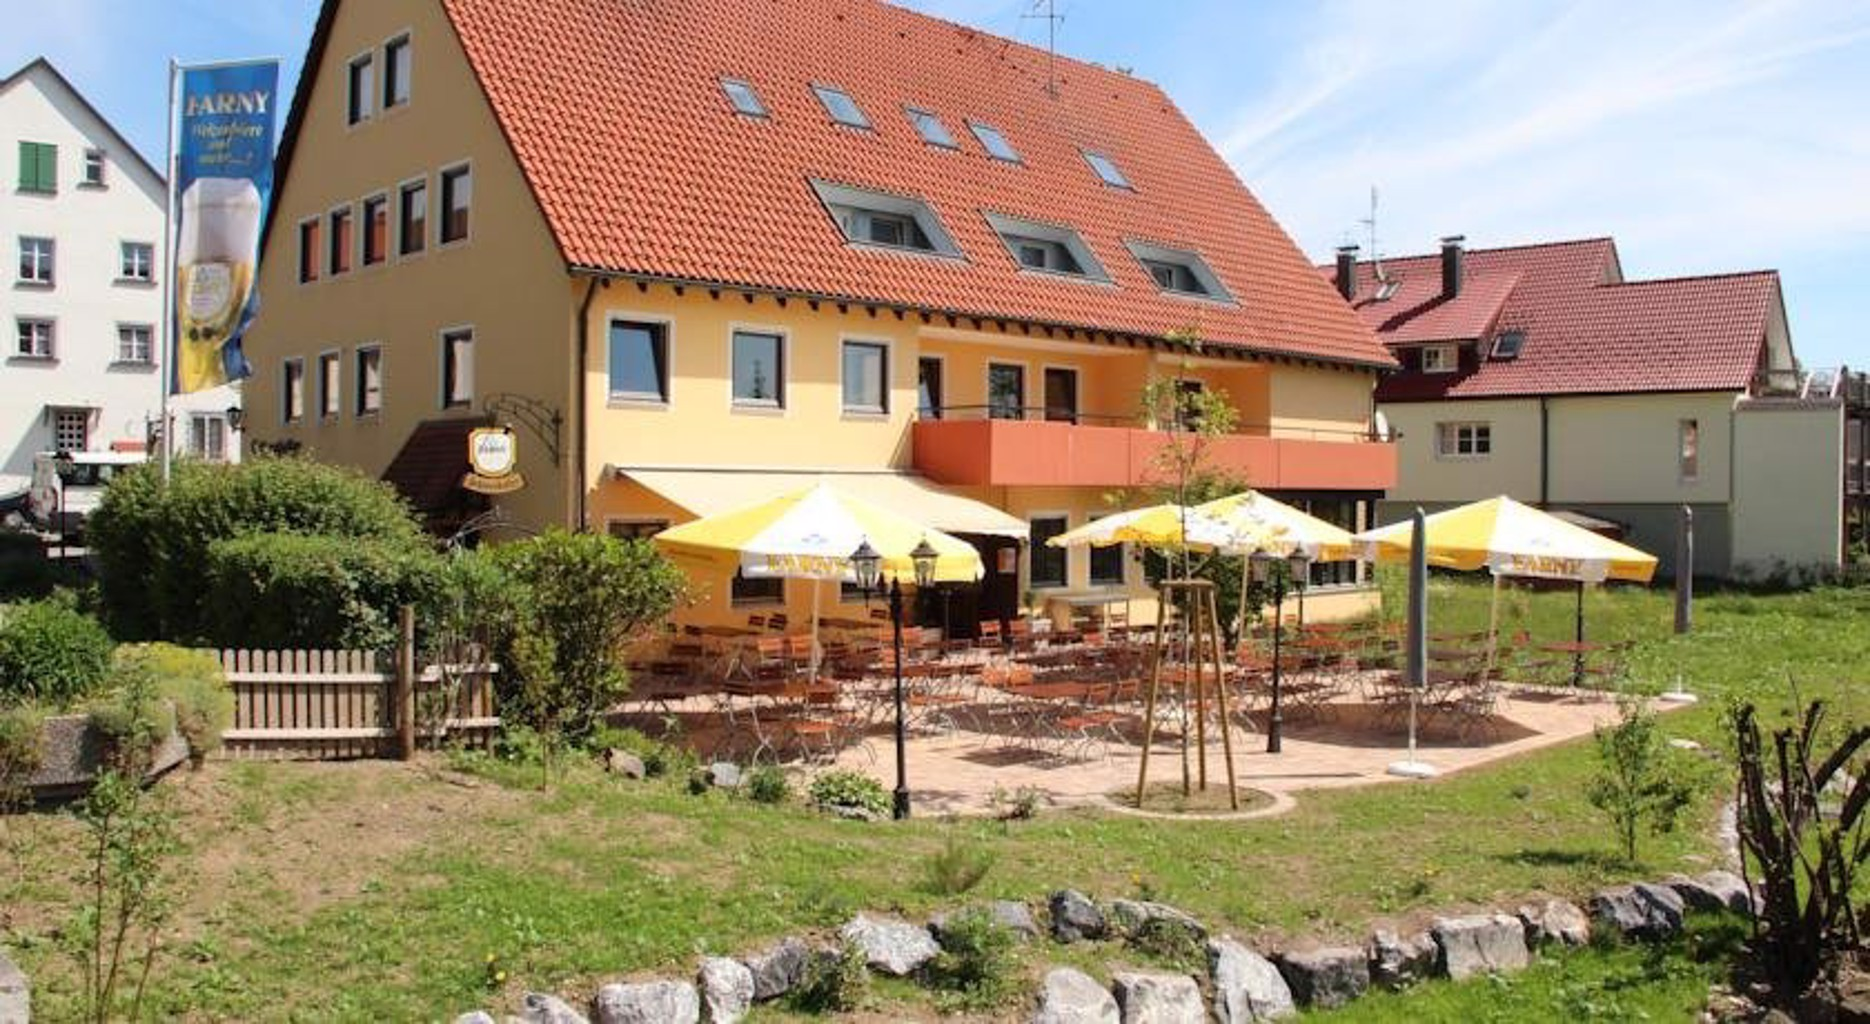 Gallery image of Hotel Schlosskeller